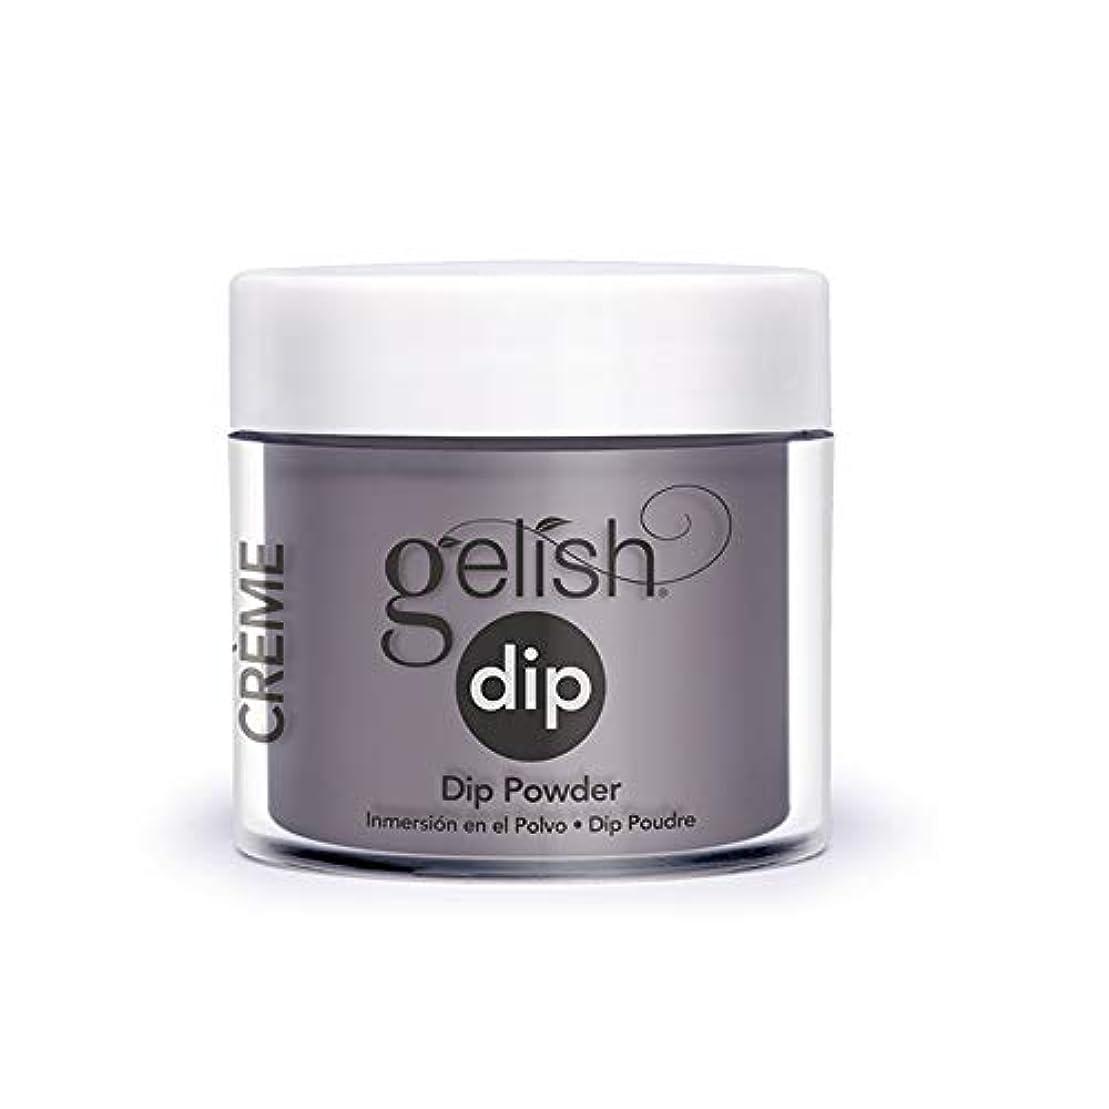 Harmony Gelish - Acrylic Dip Powder - Met my Match - 23g / 0.8oz